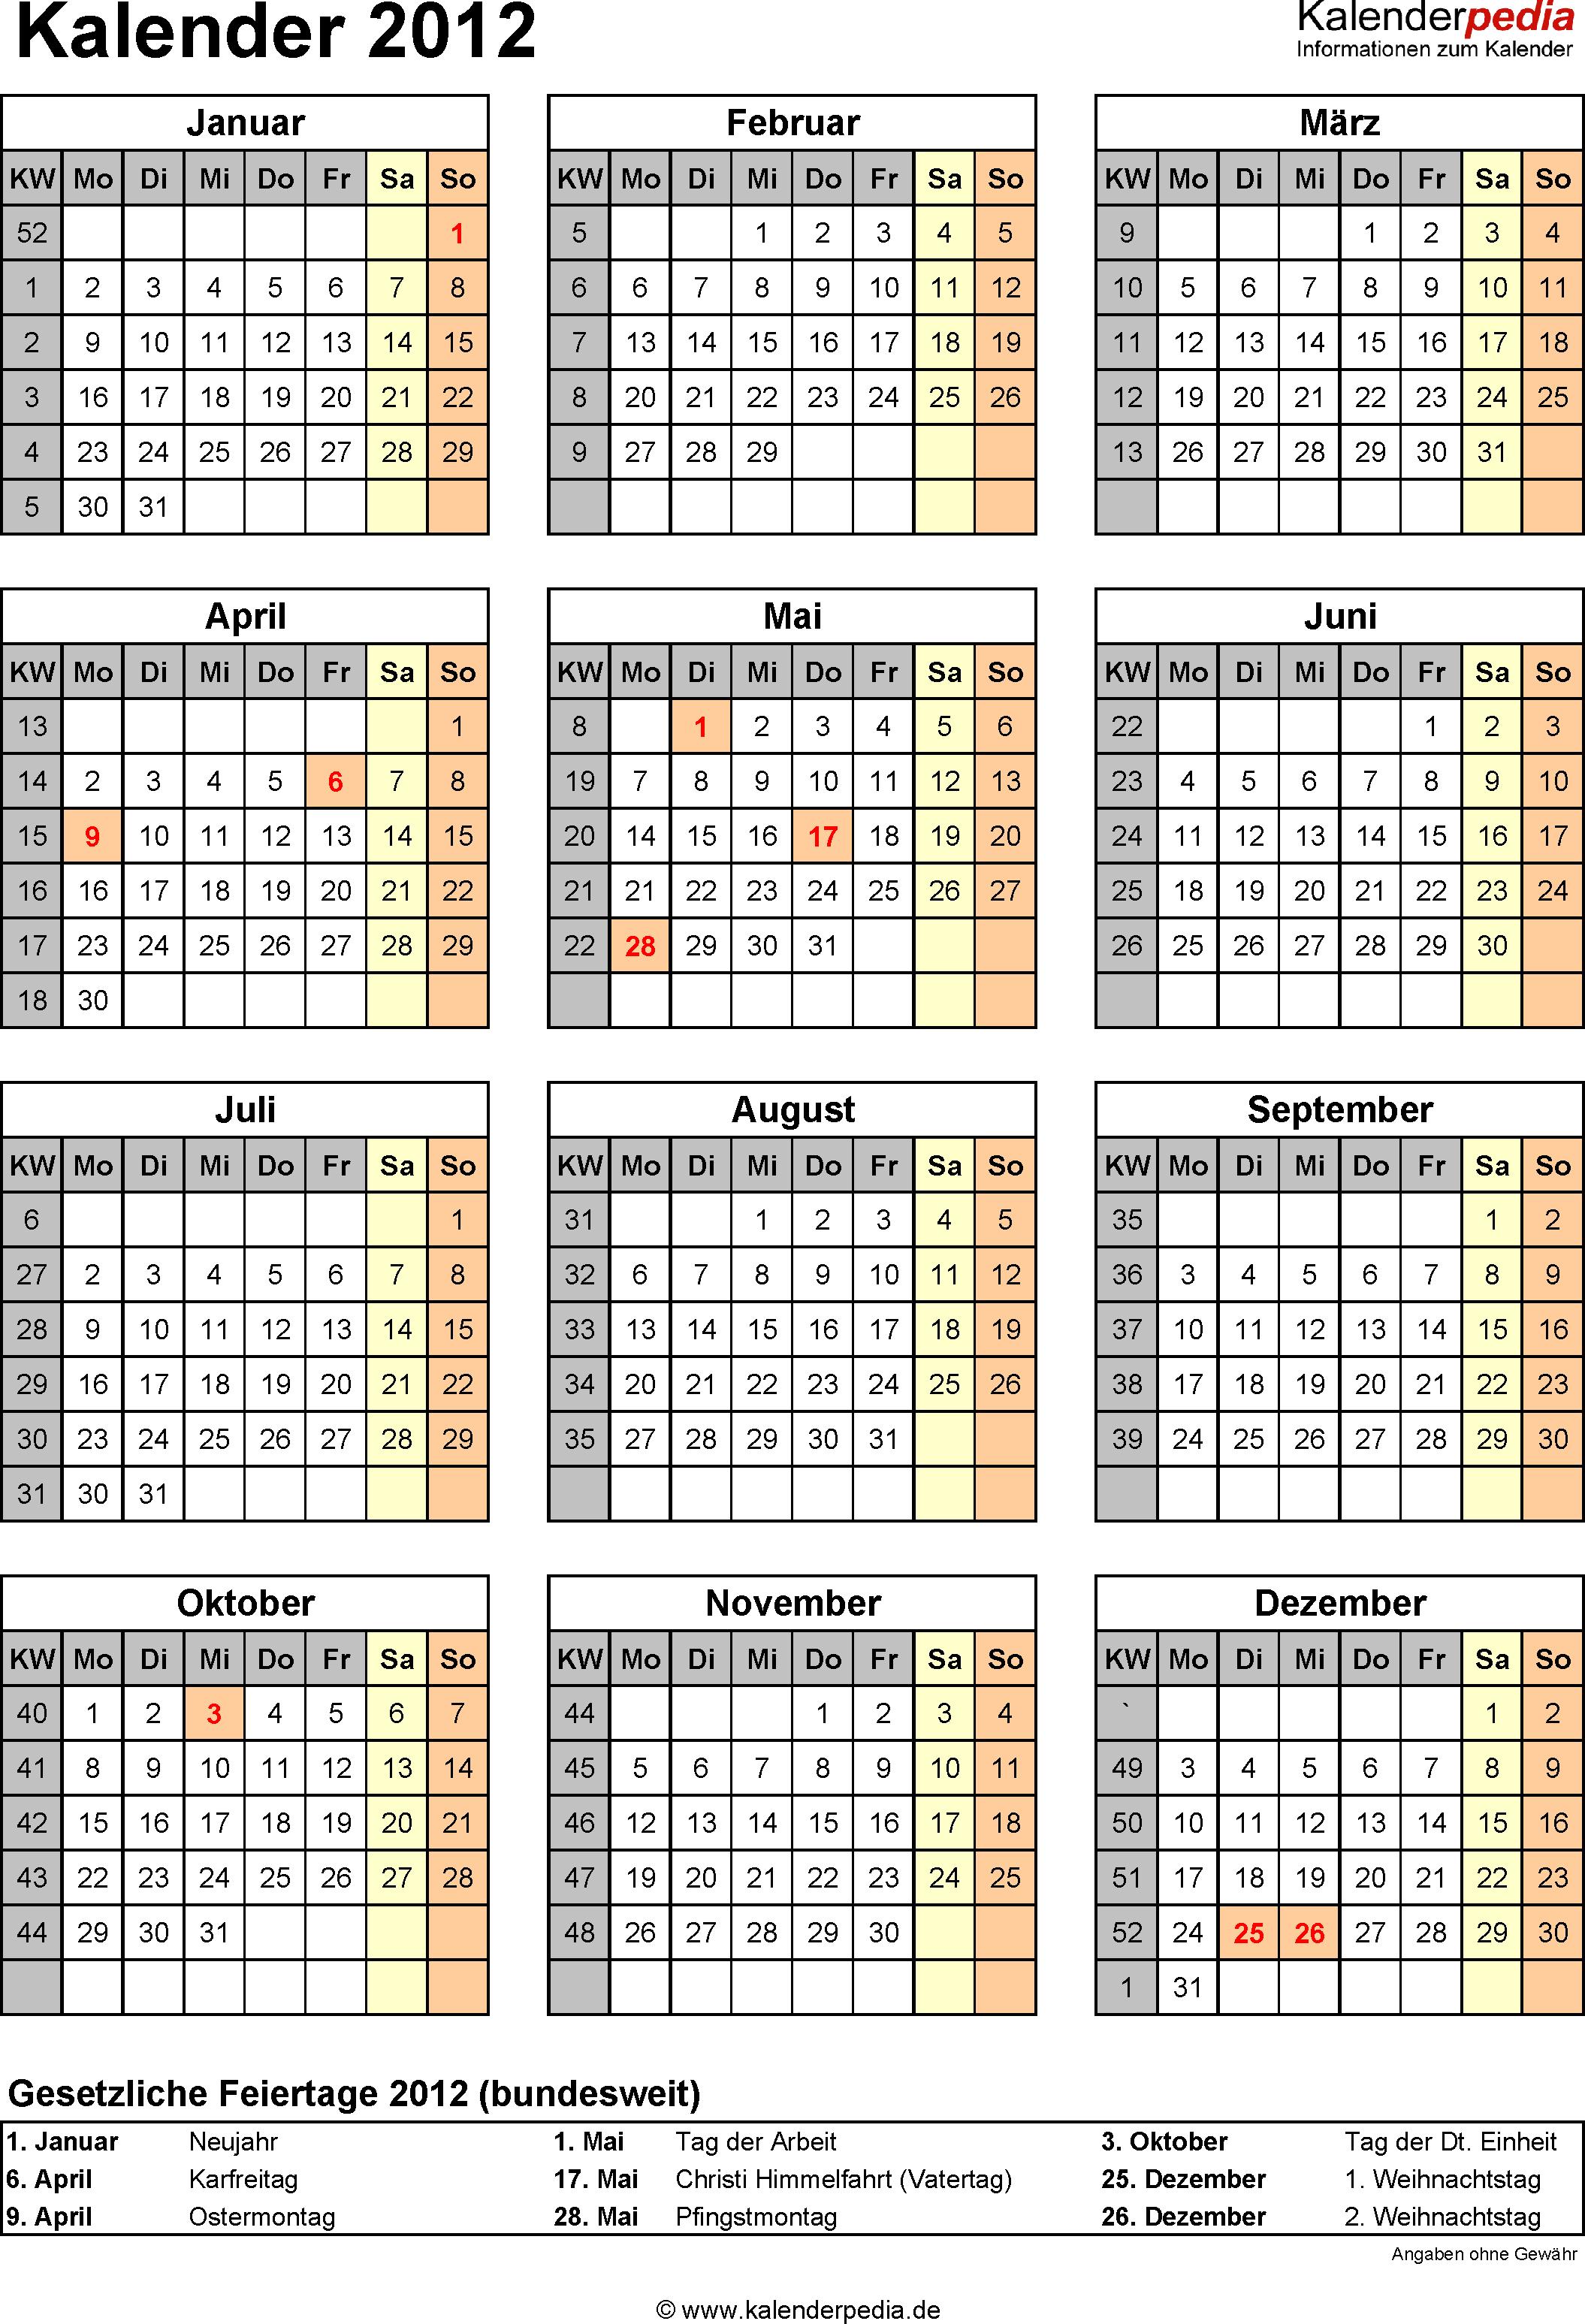 Kalender 2012 im Hochformat